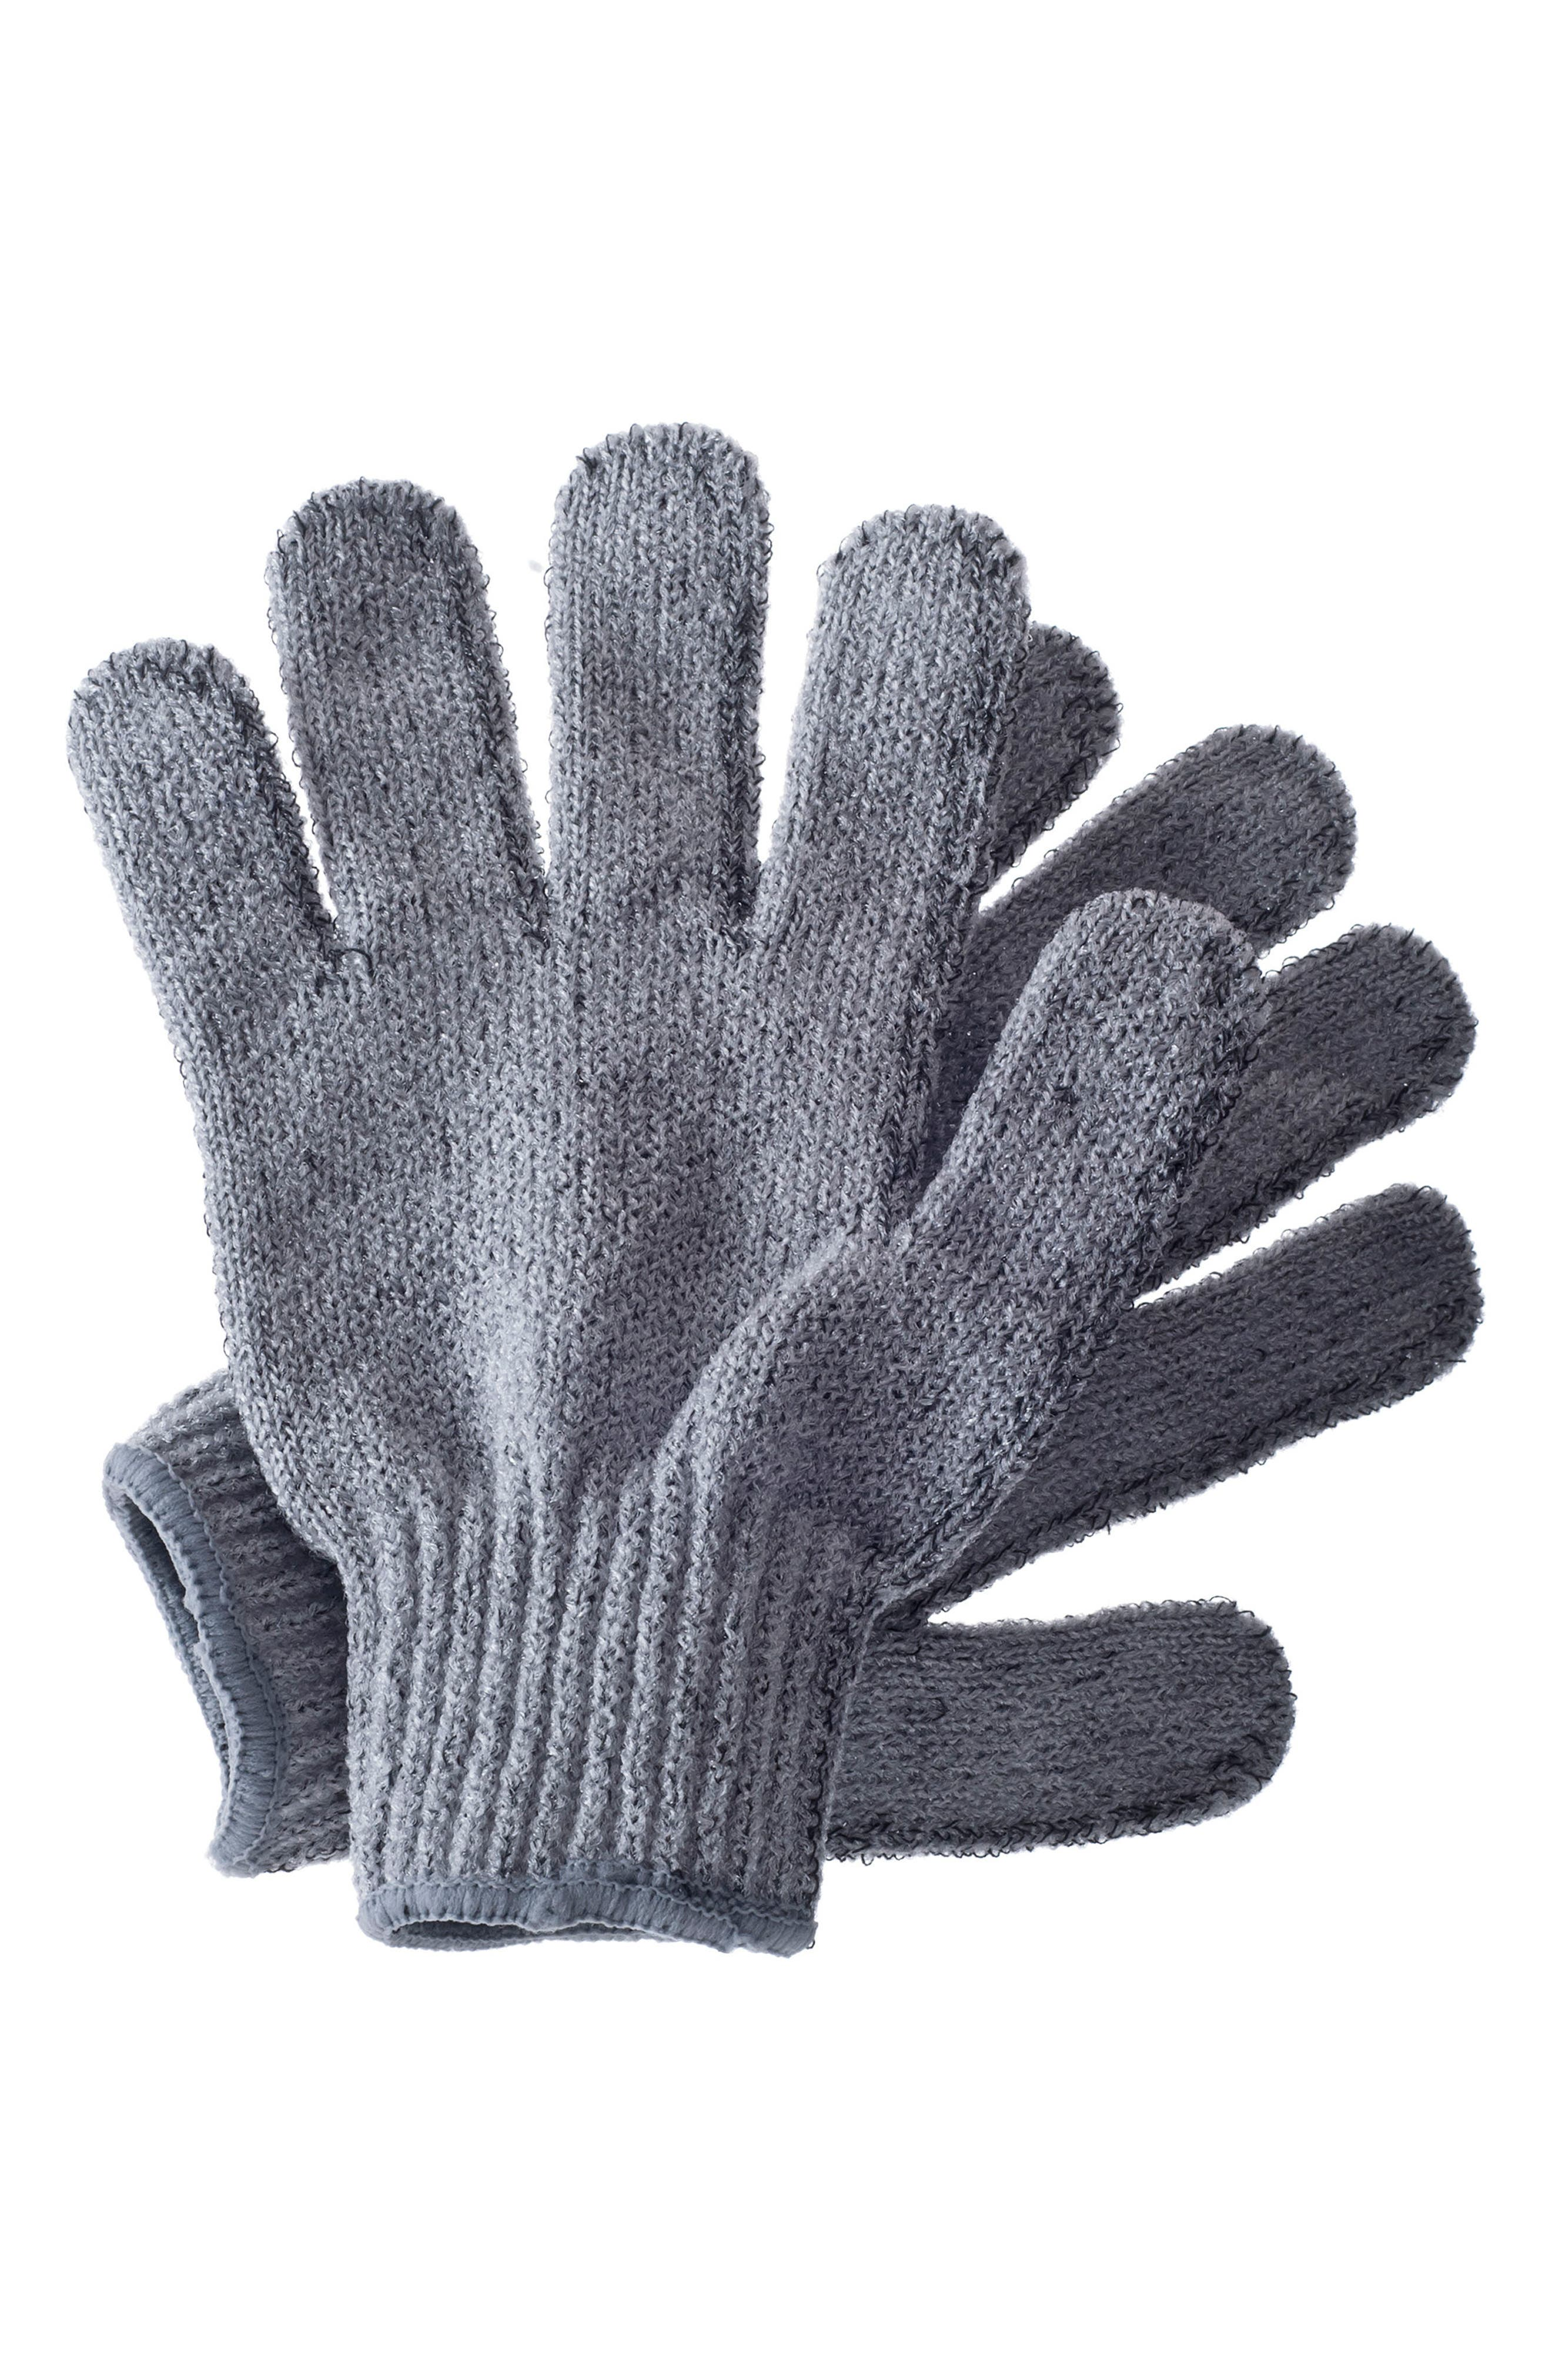 Carbonized Exfoliating Gloves,                         Main,                         color, 000